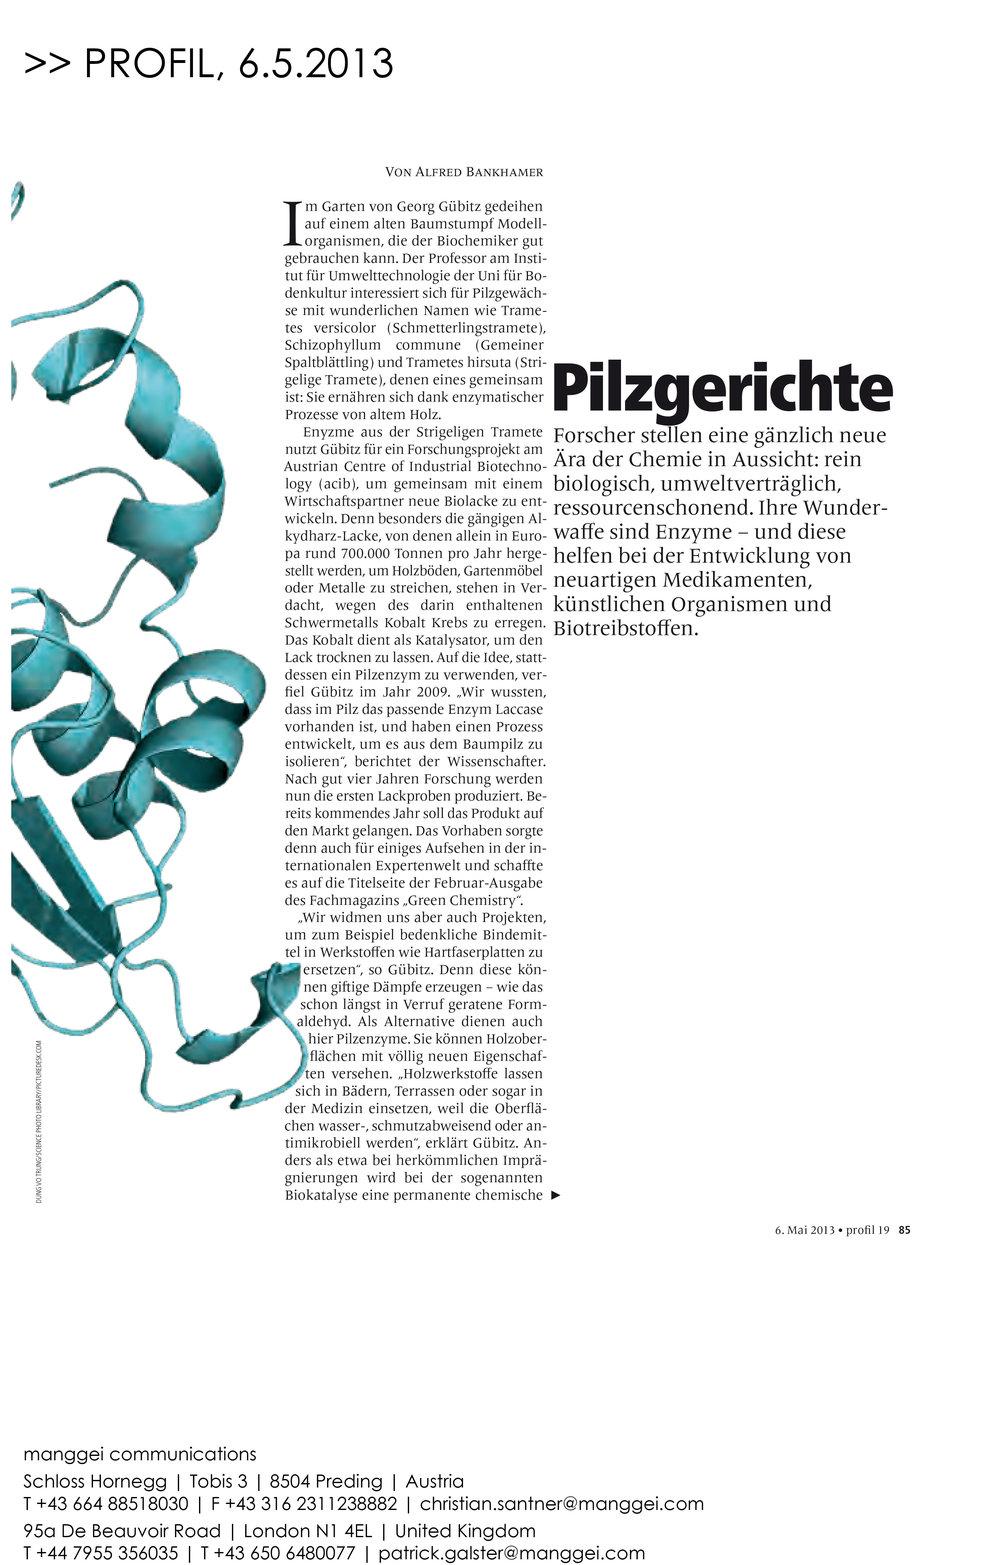 manggei-communications---presse-clippings-komplett---journalistenreise-2013_-4.jpg